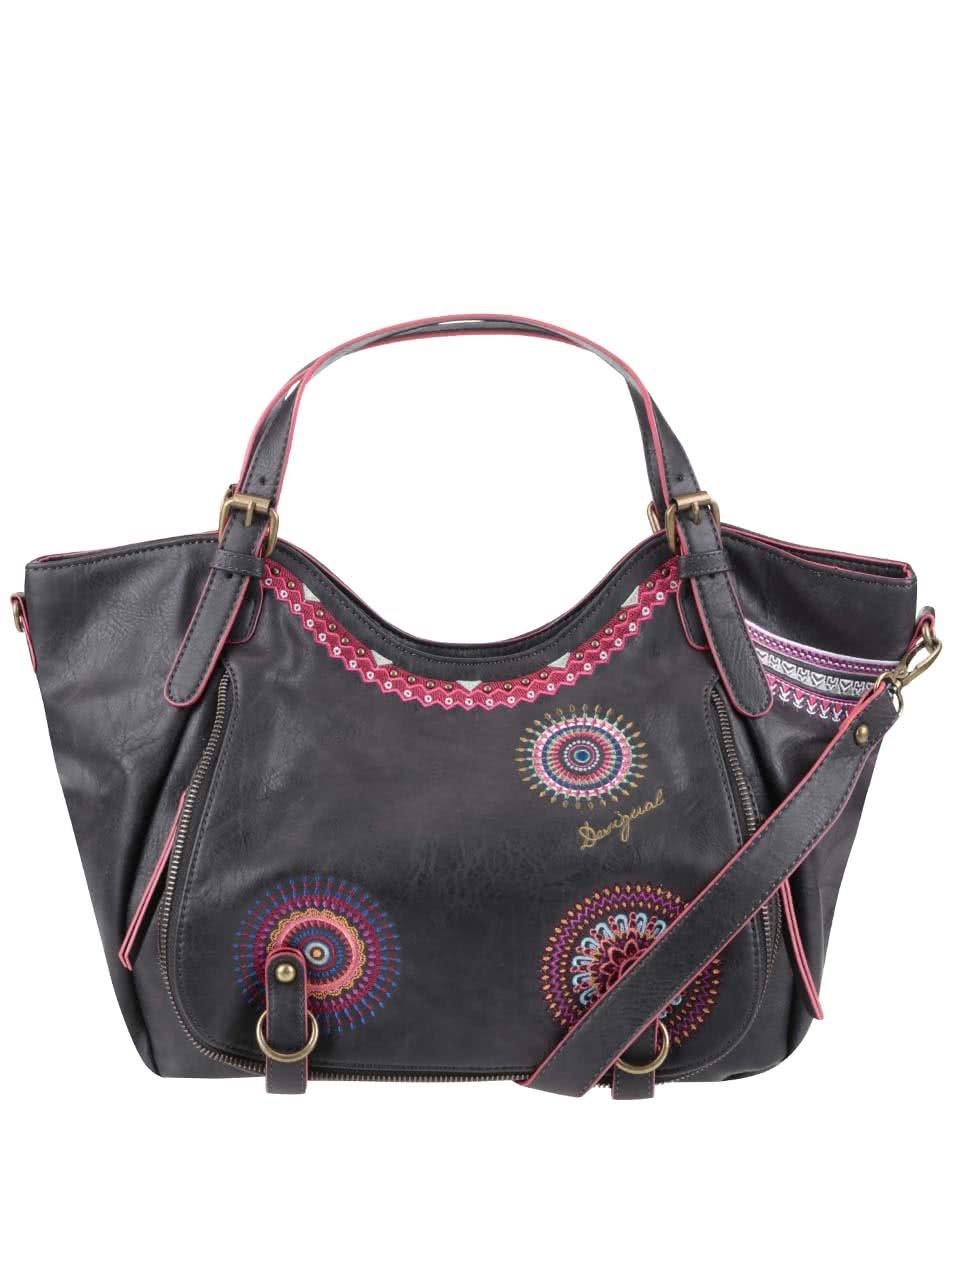 Tmavě hnědá kabelka s růžovými vzory Desigual Rotterdam Greta